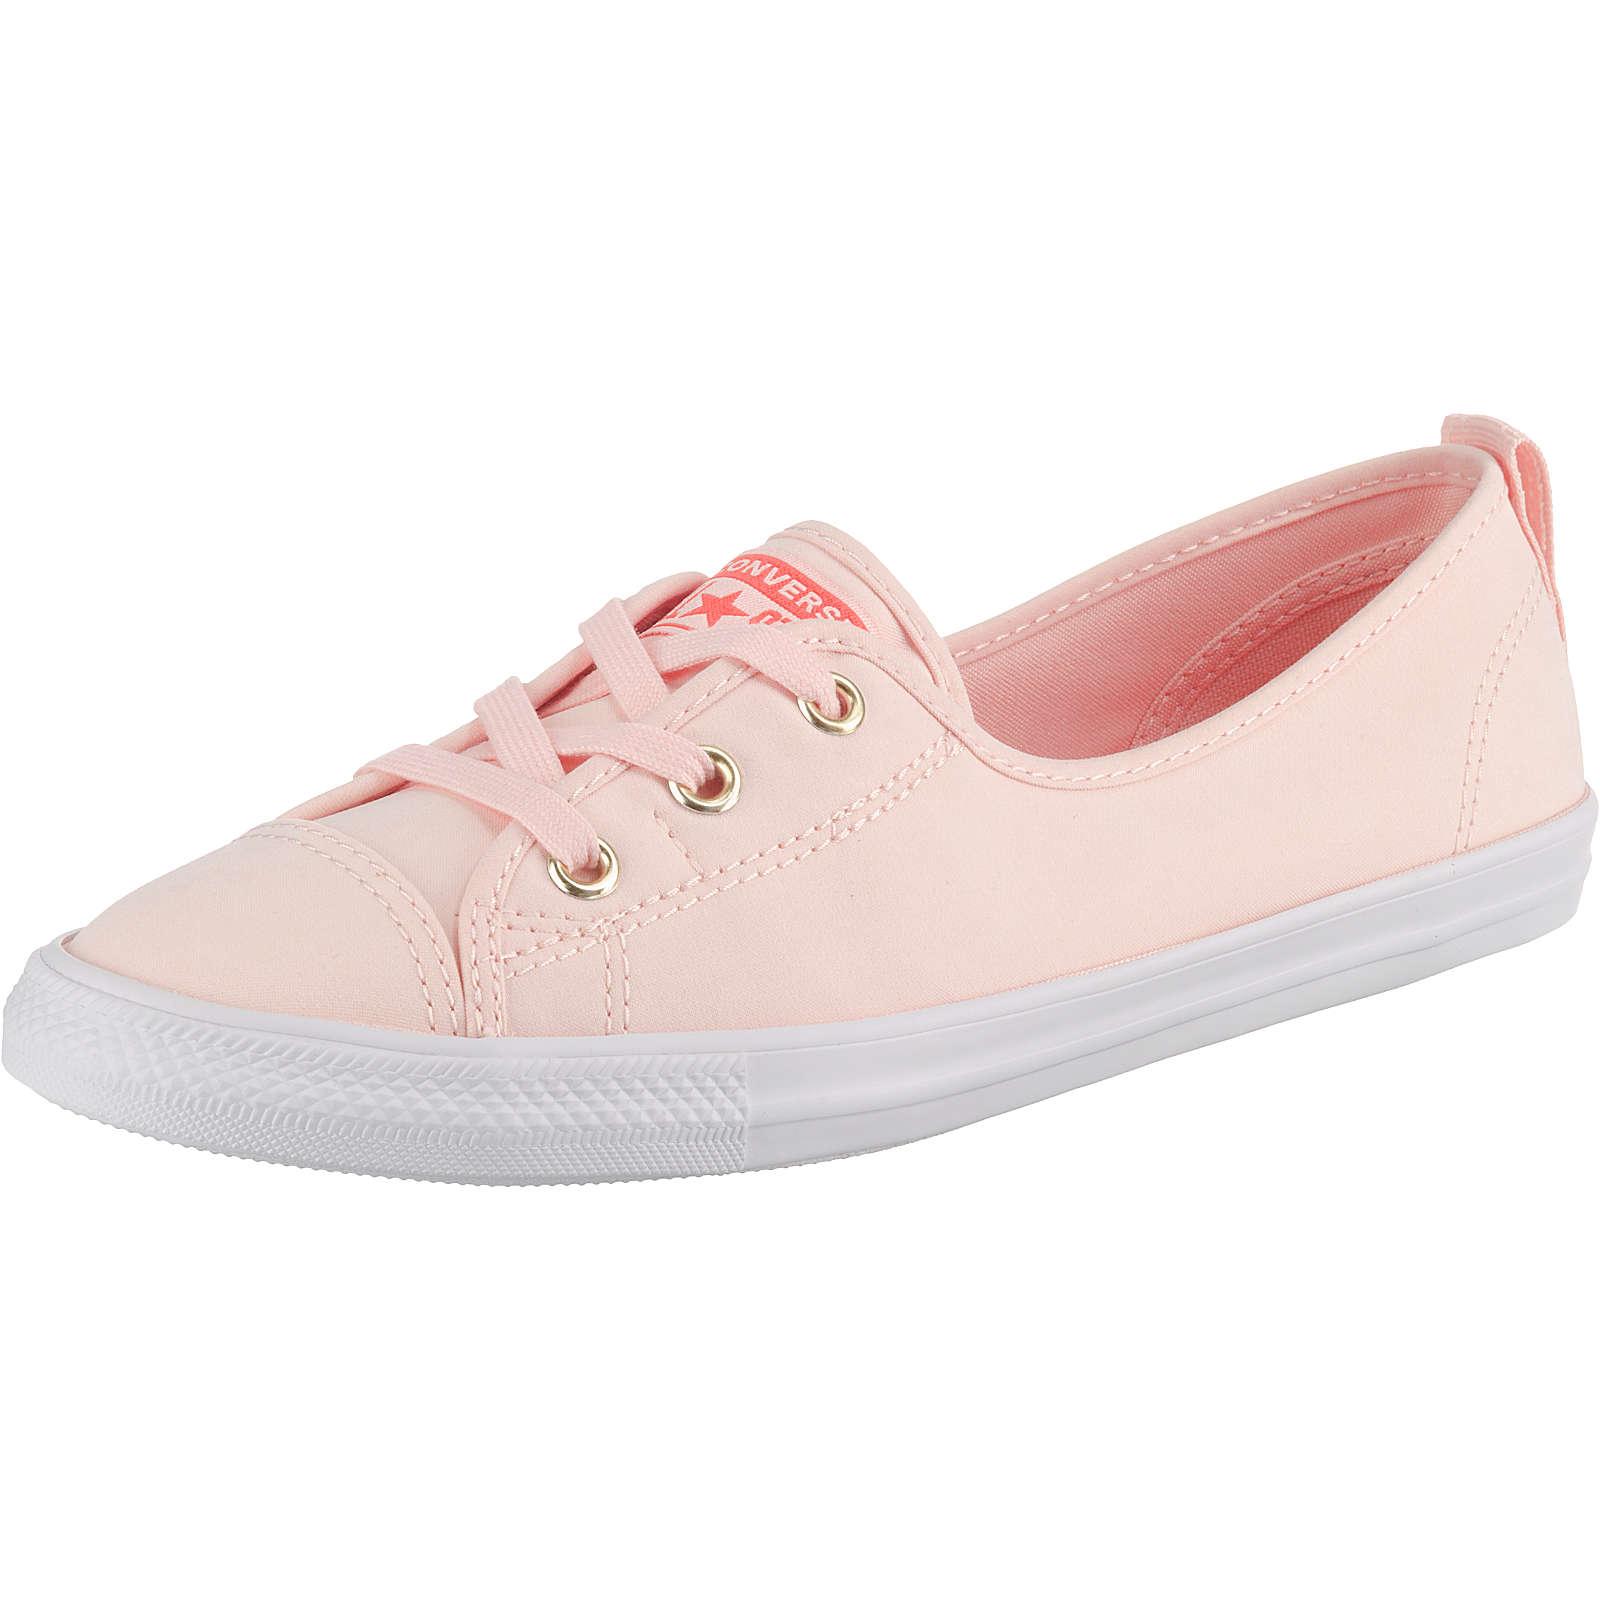 CONVERSE Chuck Taylor All Star Ballet Lace Slip Sneakers Low rosa Damen Gr. 42,5